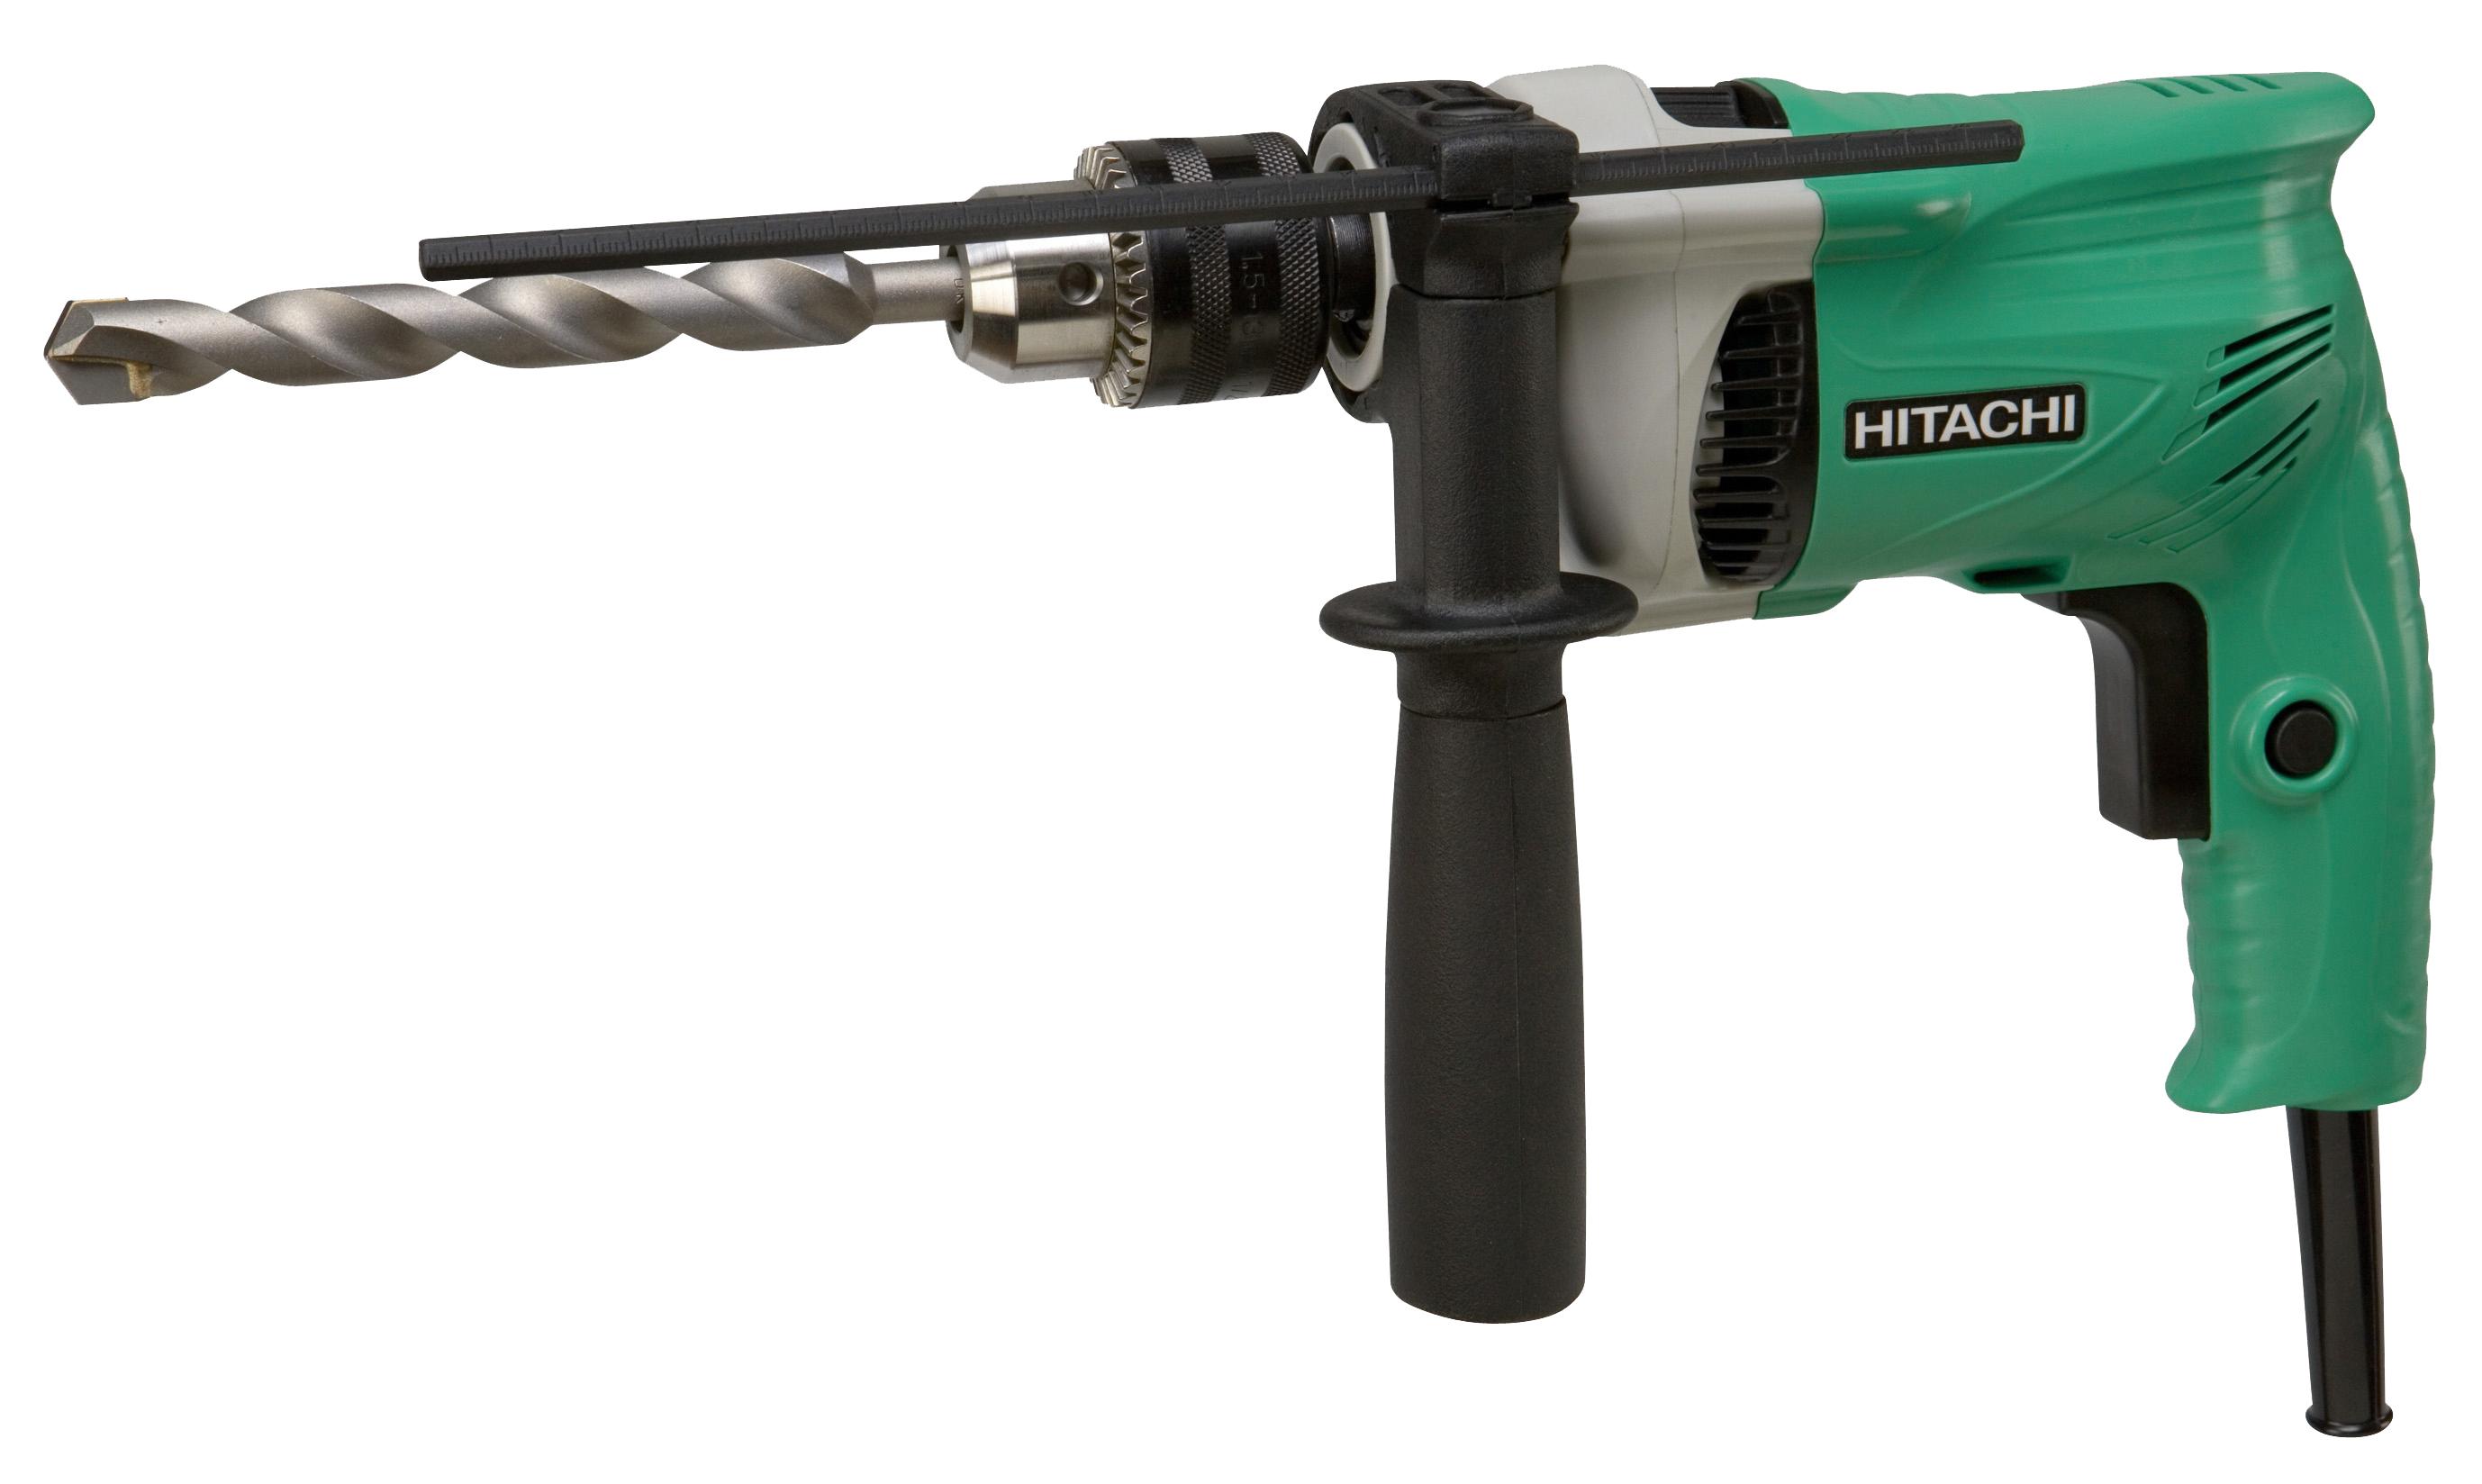 DV16SS-Drill-percussion-2-speeds-600w